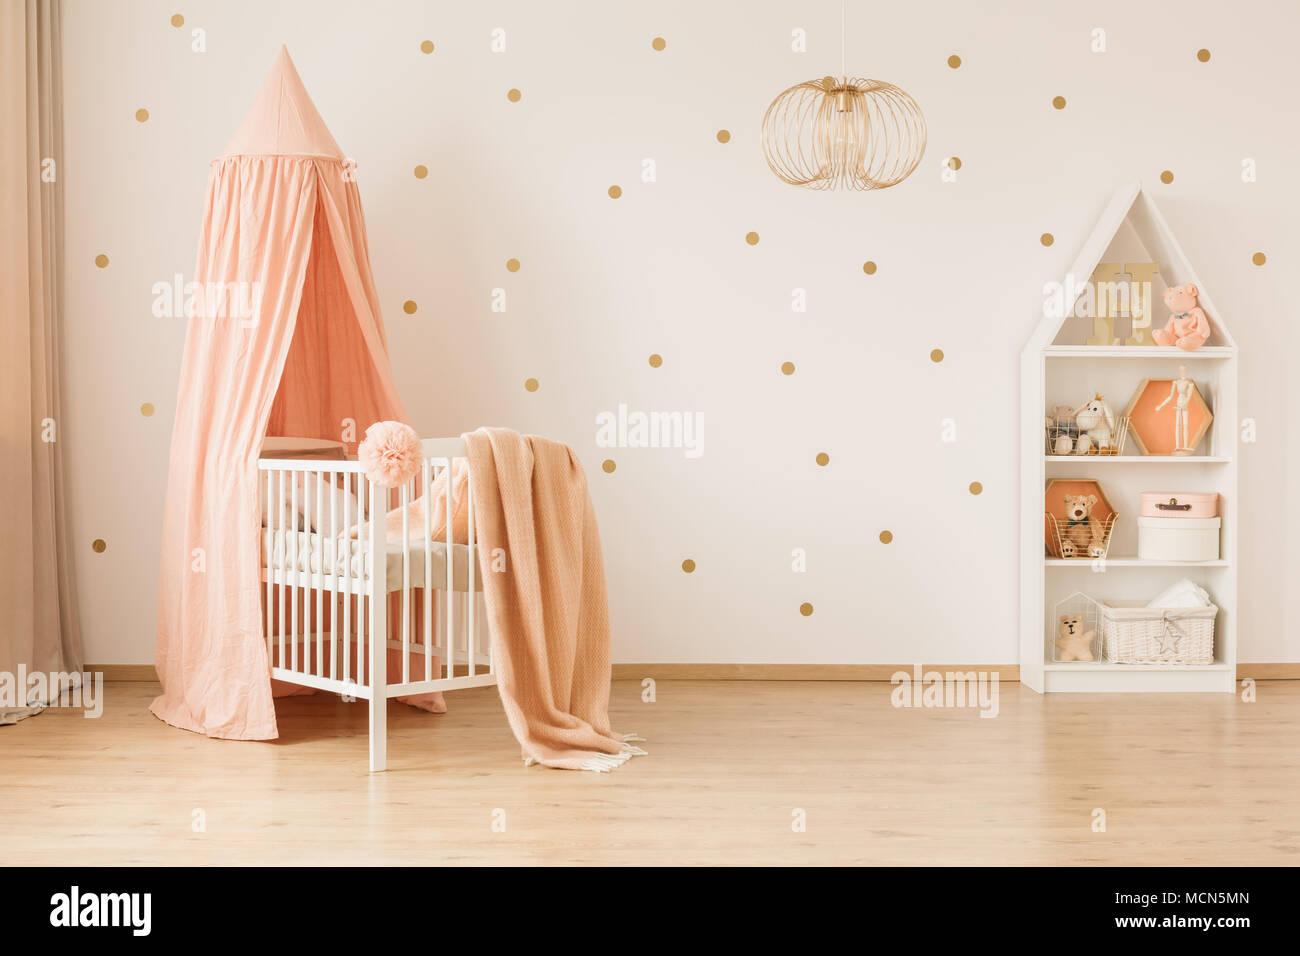 Babybett Gold | Weißes Kinderbett